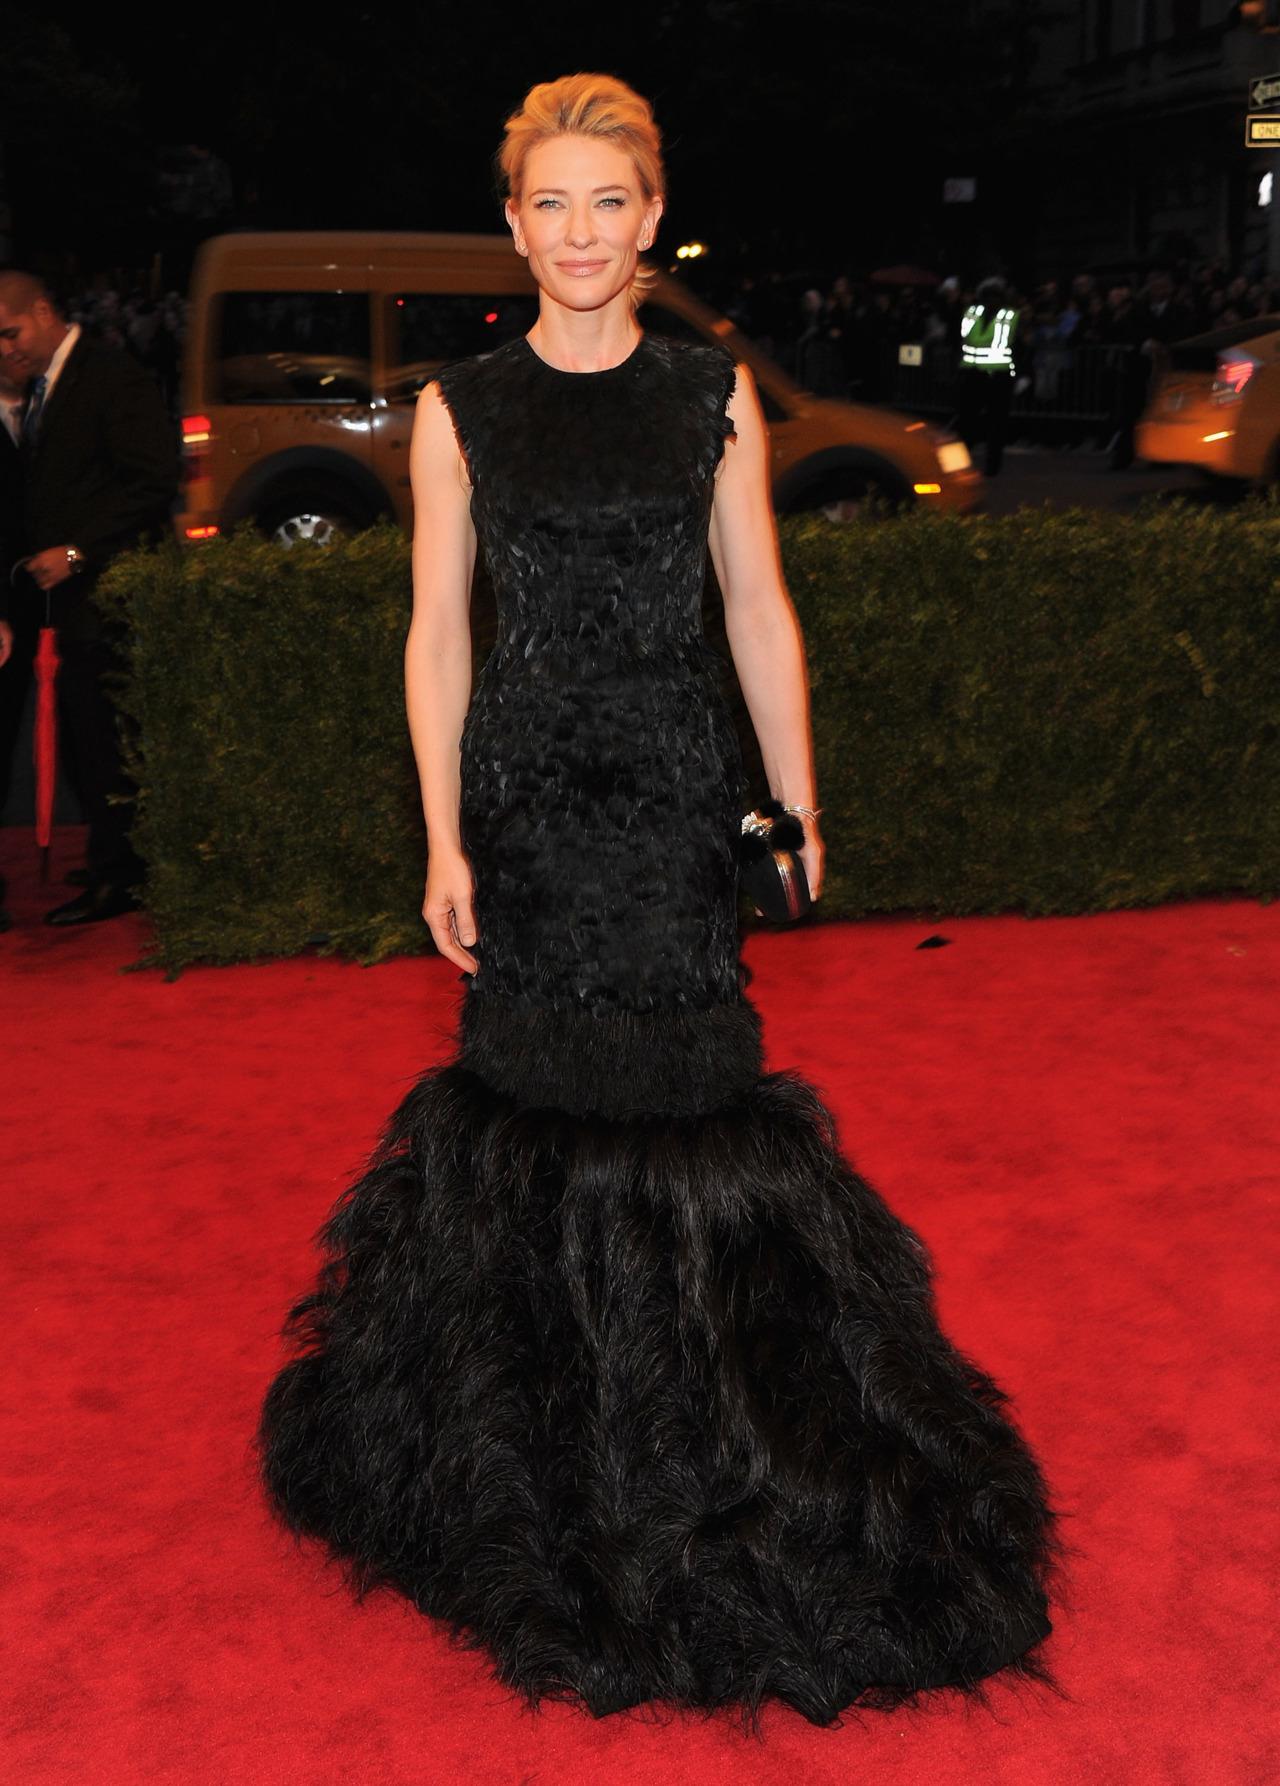 Cate Blanchet - 2012 Met Gala